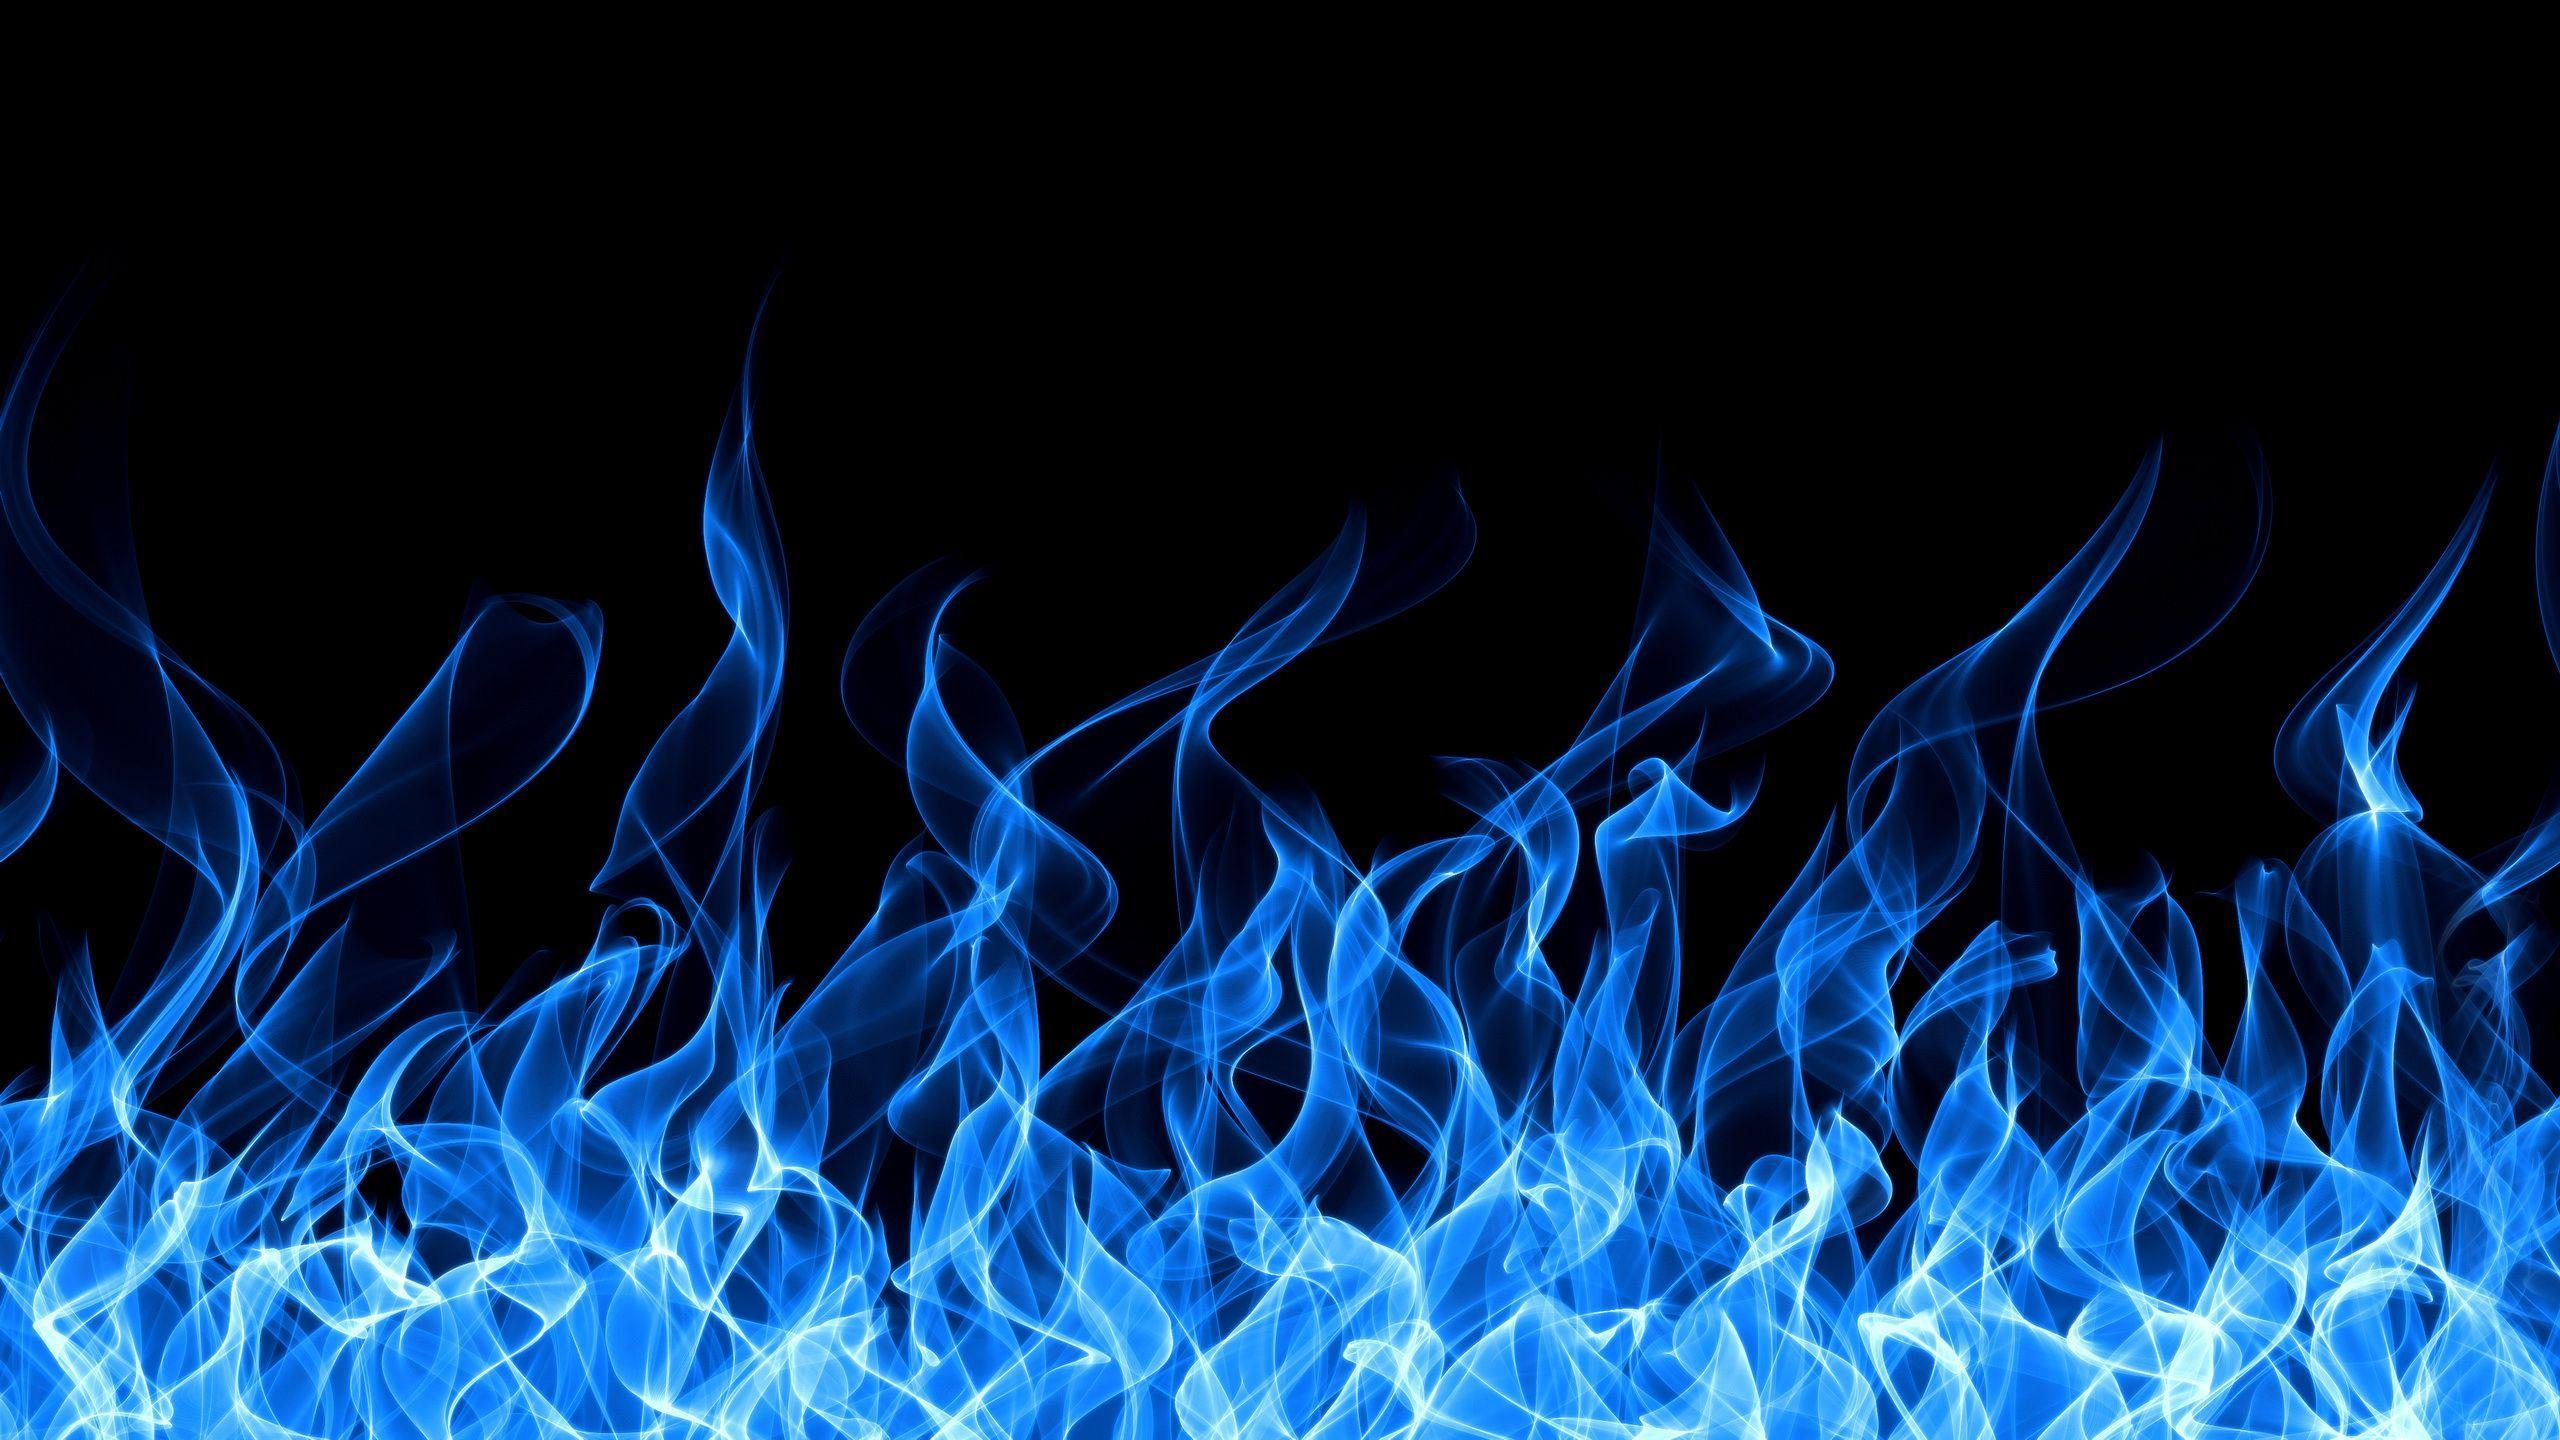 Blue Flames Wallpapers Wallpaper Cave